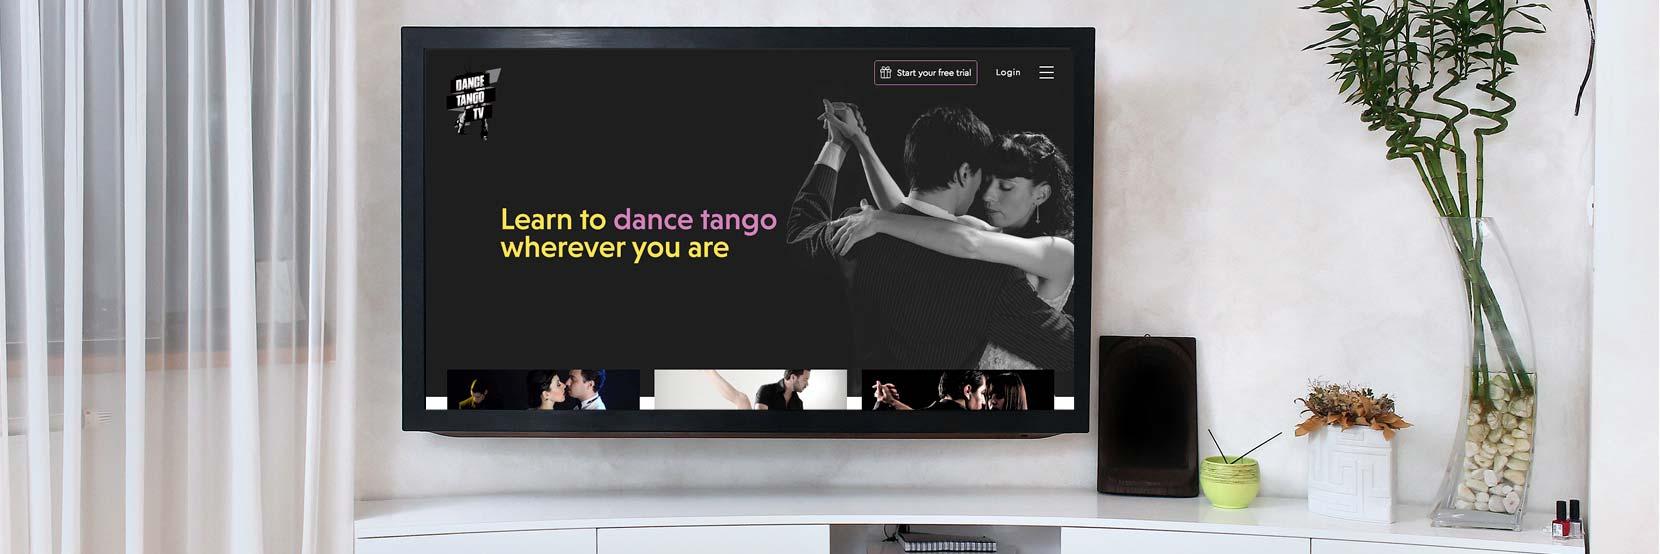 DanceTangoTV is Now Live! | Online Tango Classes